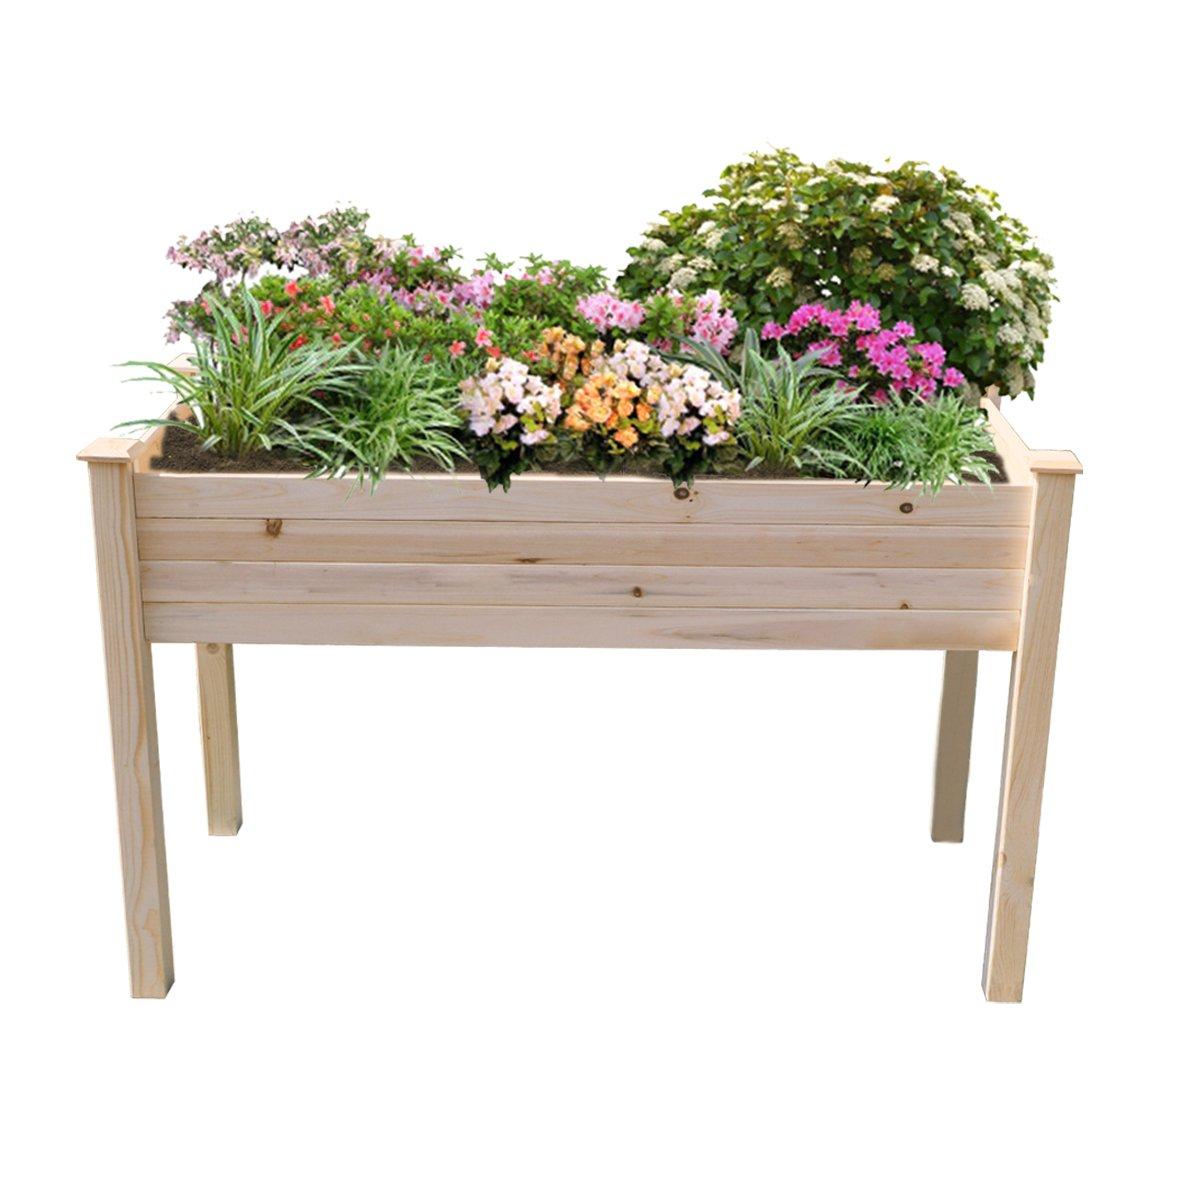 Yardeen Cedar Wooden Raised Planter Bed Flower Yard Gardening Planter for Patio Deck Balcony